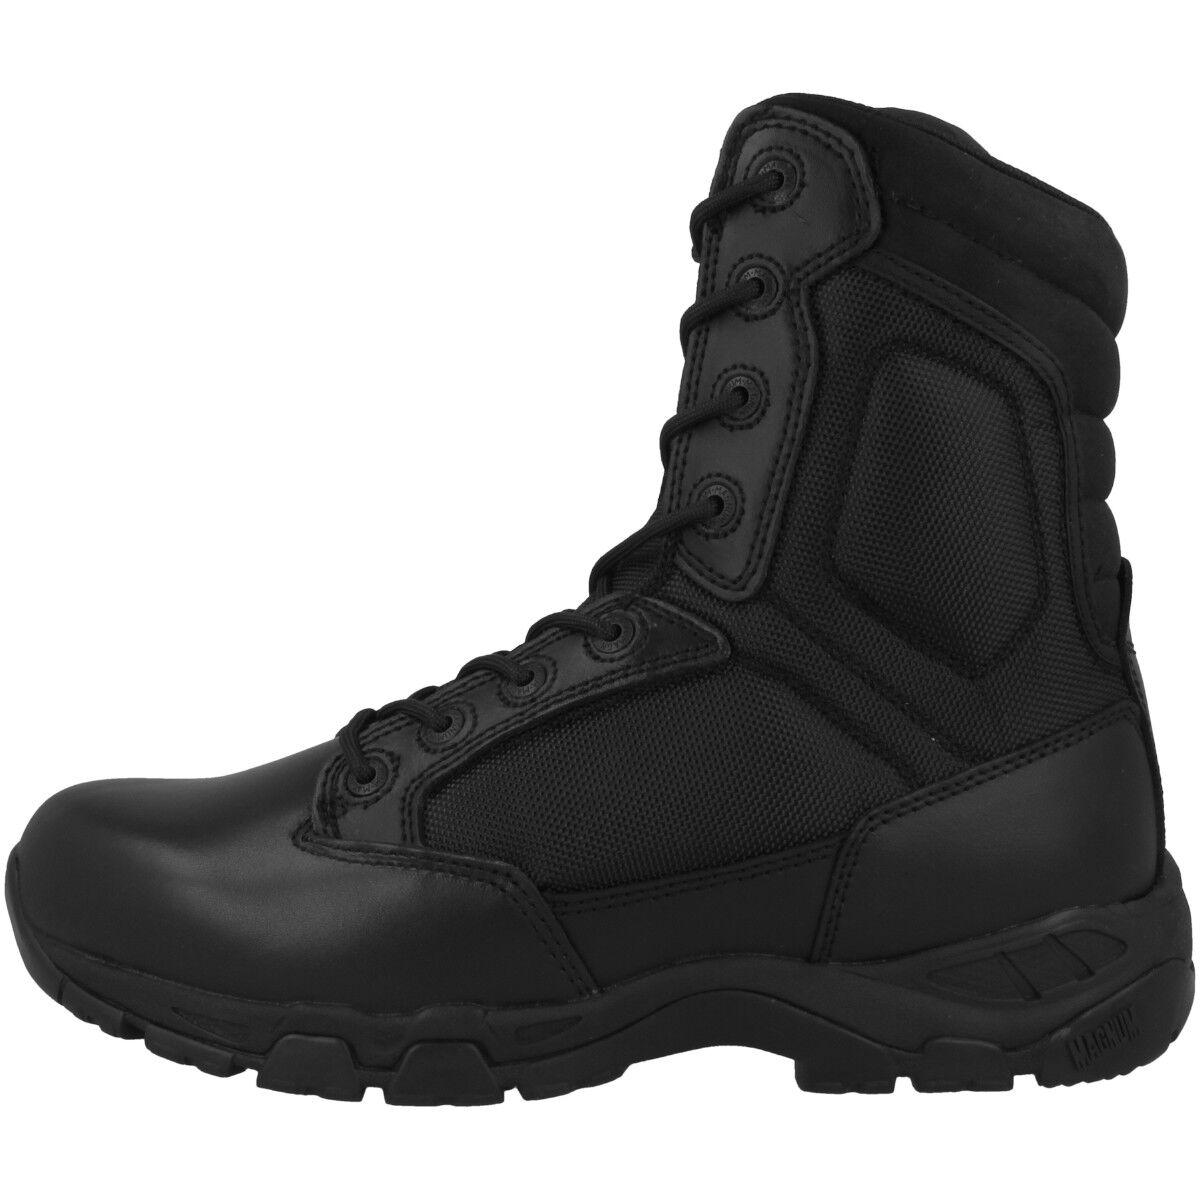 Magnum 0 Zapatos M800639 Pro Hitec Botas Hi Zip 8 01 Tec 021 POkw0n